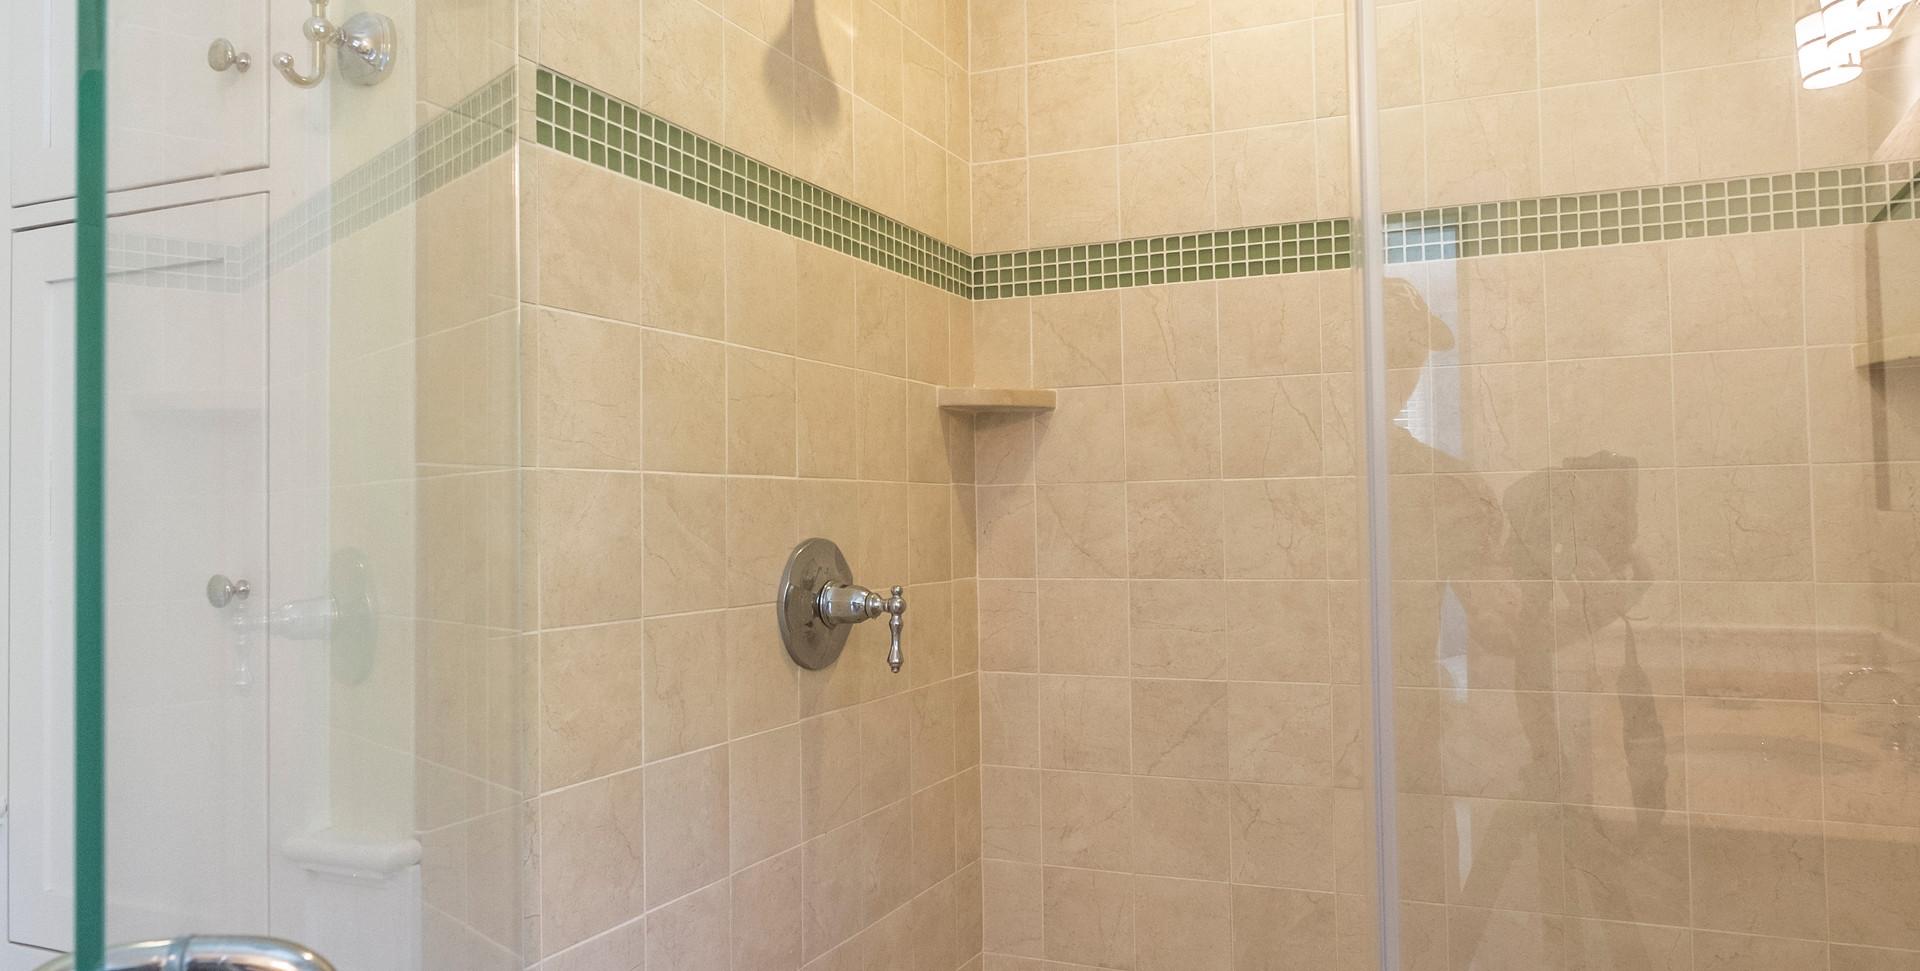 Cape Cod Tiled Shower